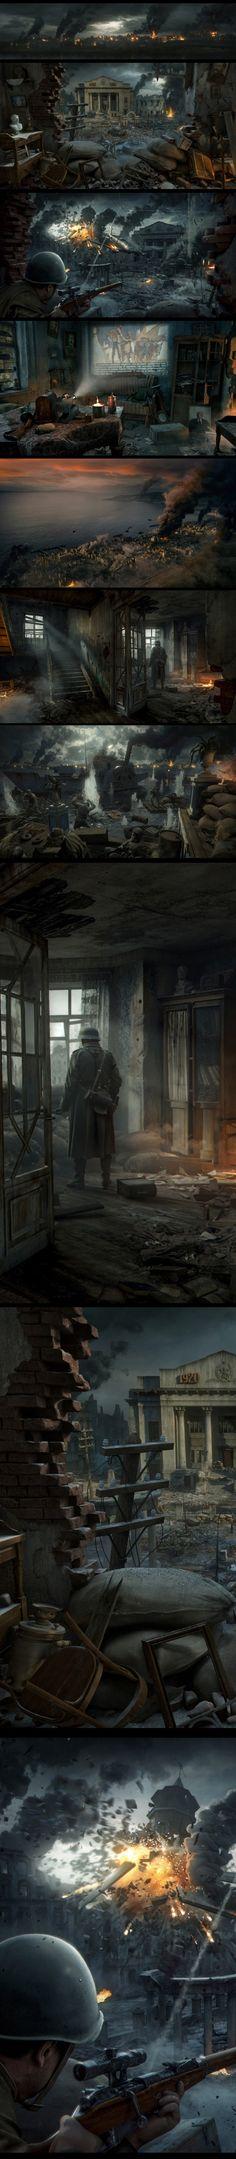 Stalingrad on Digital Art Served